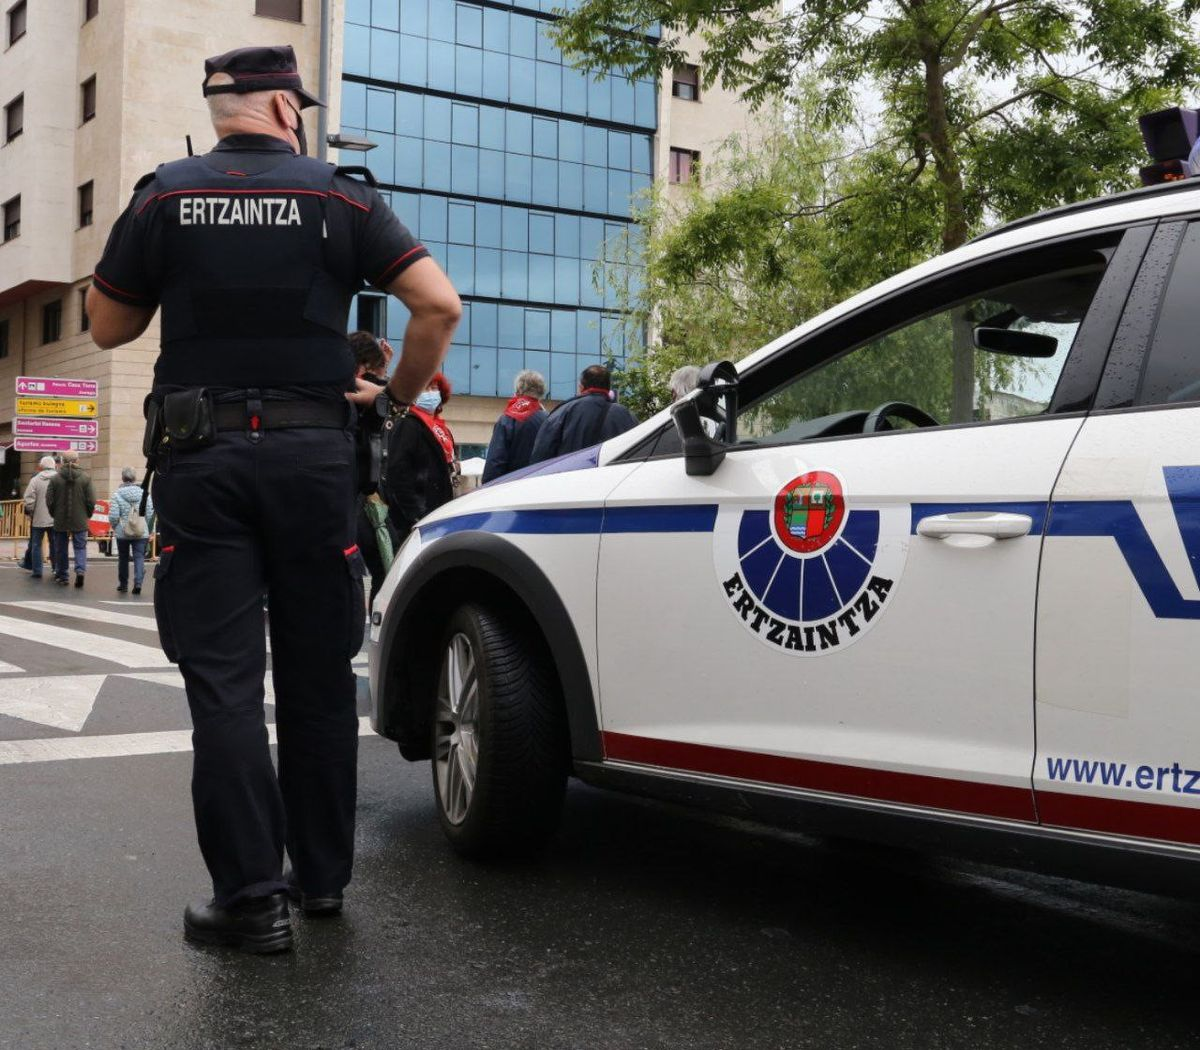 Juez envía a prisión a dos de los ocho detenidos por brutal golpiza a joven en Bizkaya |  España